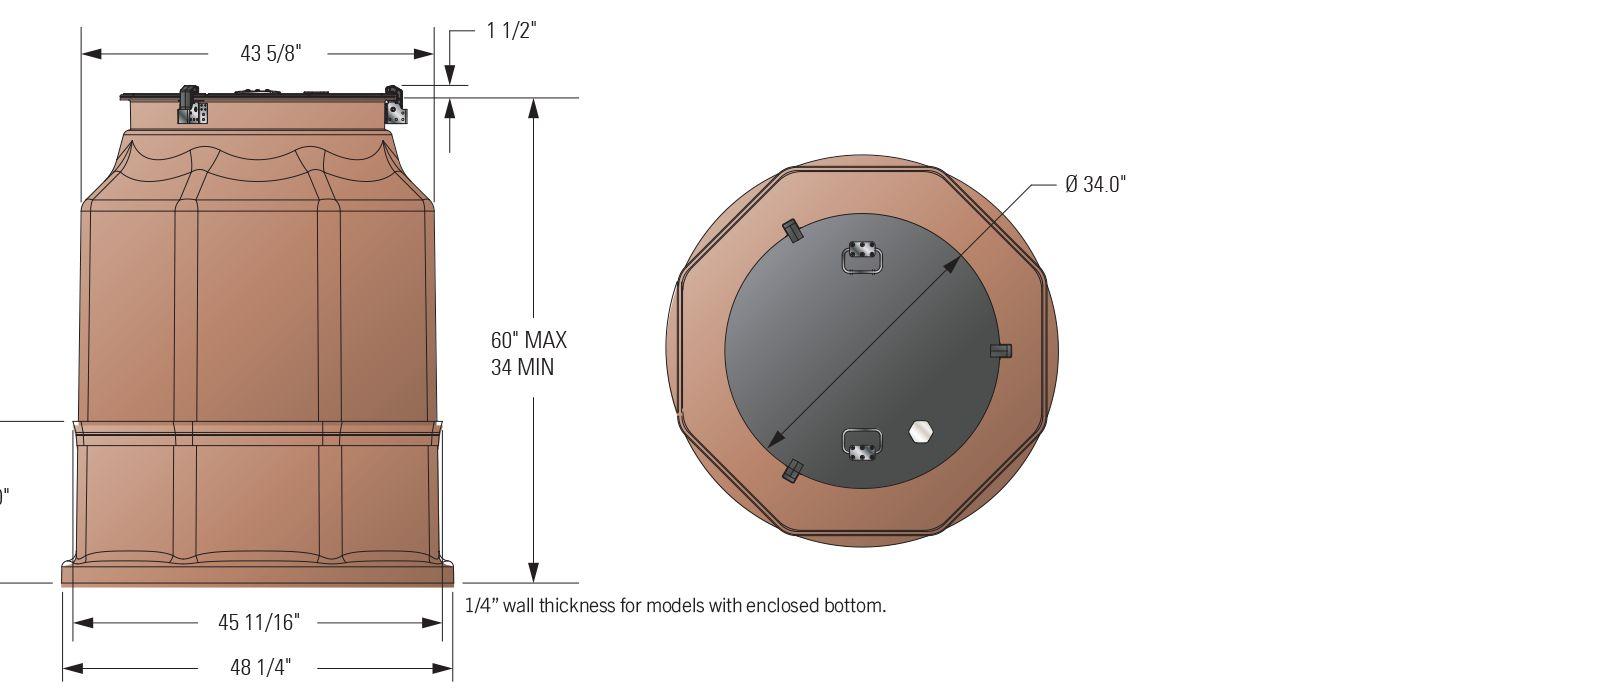 42 in. Watertight Fiberglass Tank Sump Dimensions